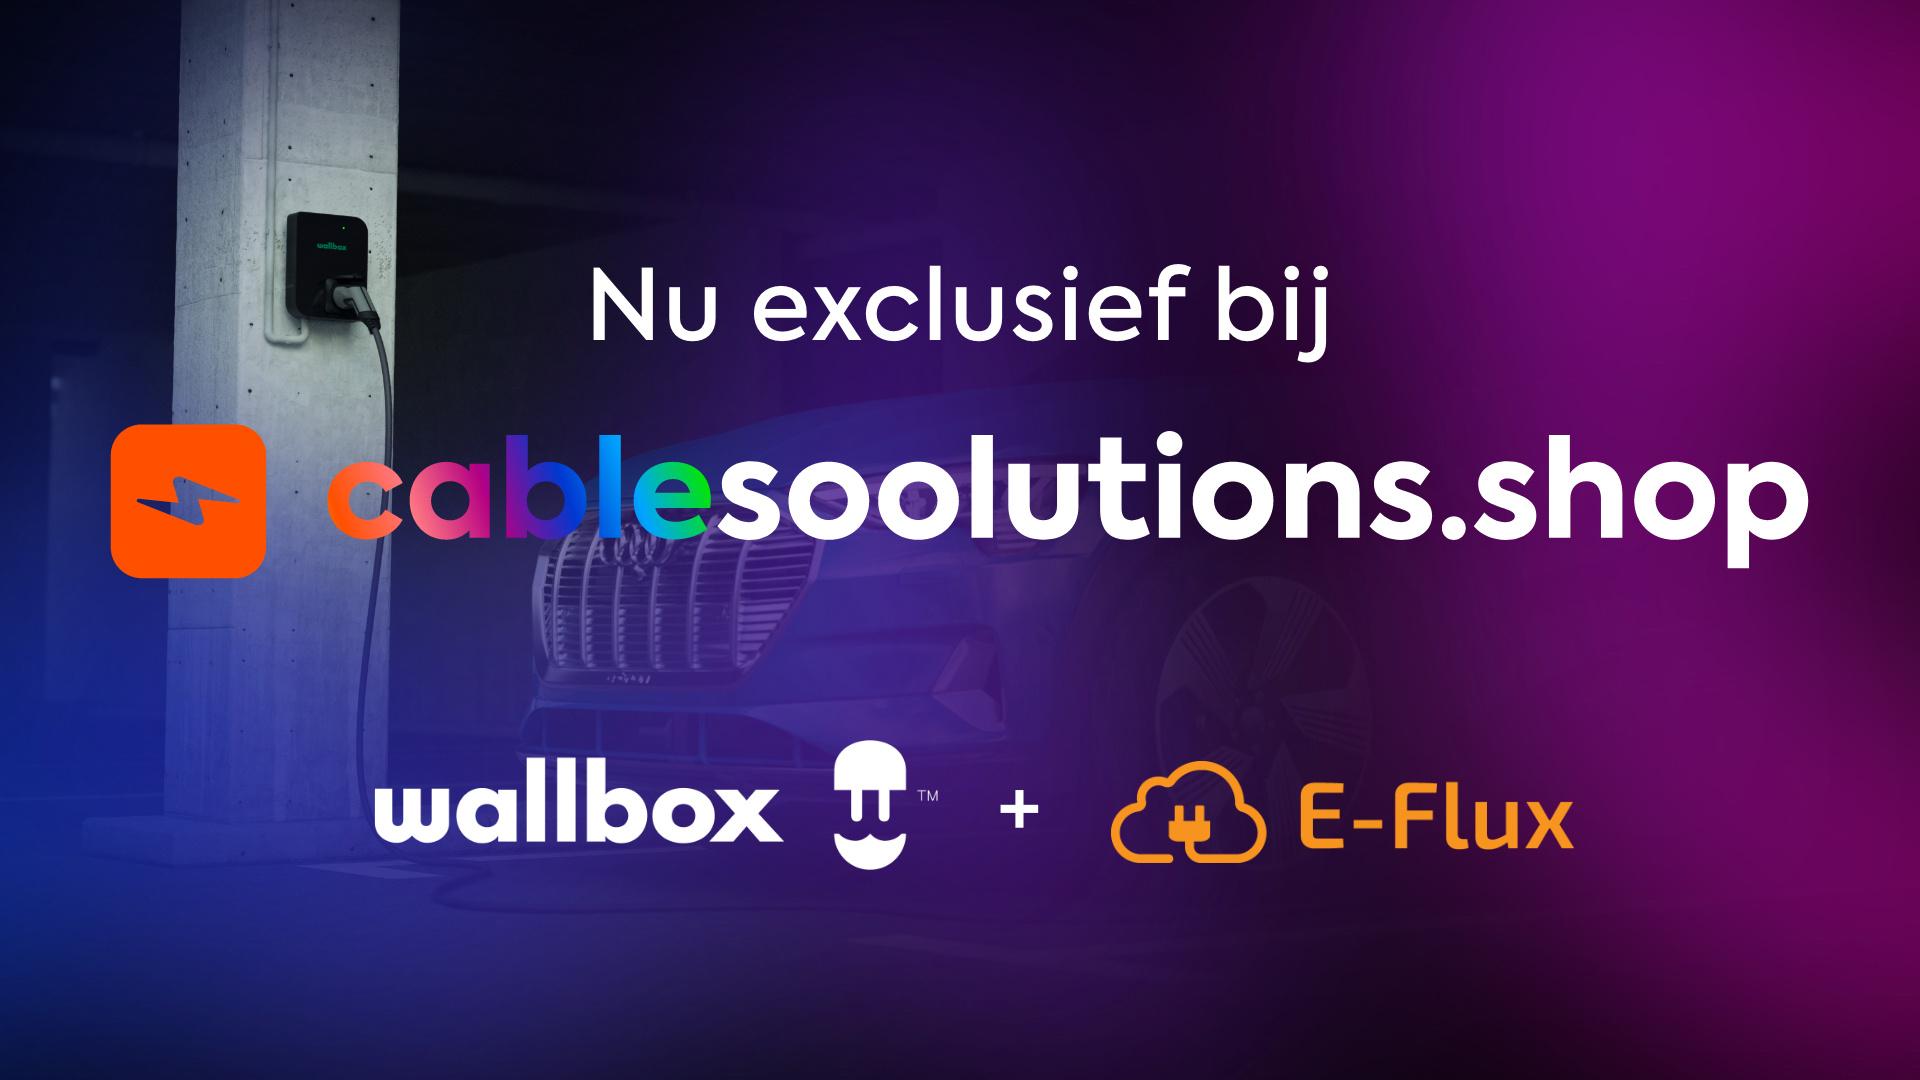 Soolutions, Wallbox en E-Flux bundelen krachten